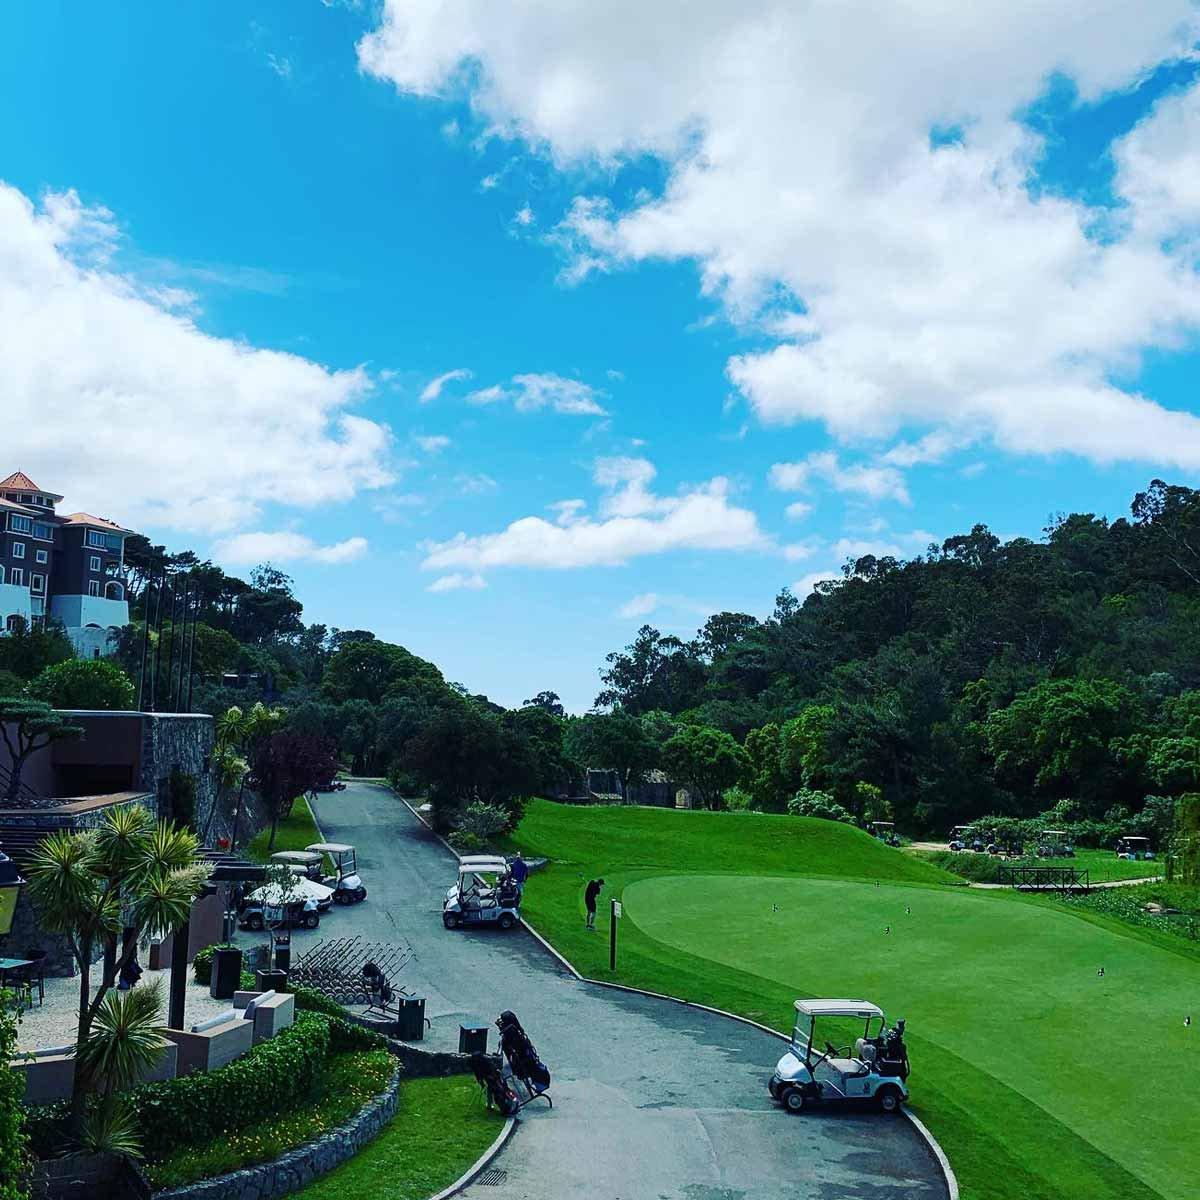 penha-longa-golf-1200x1200